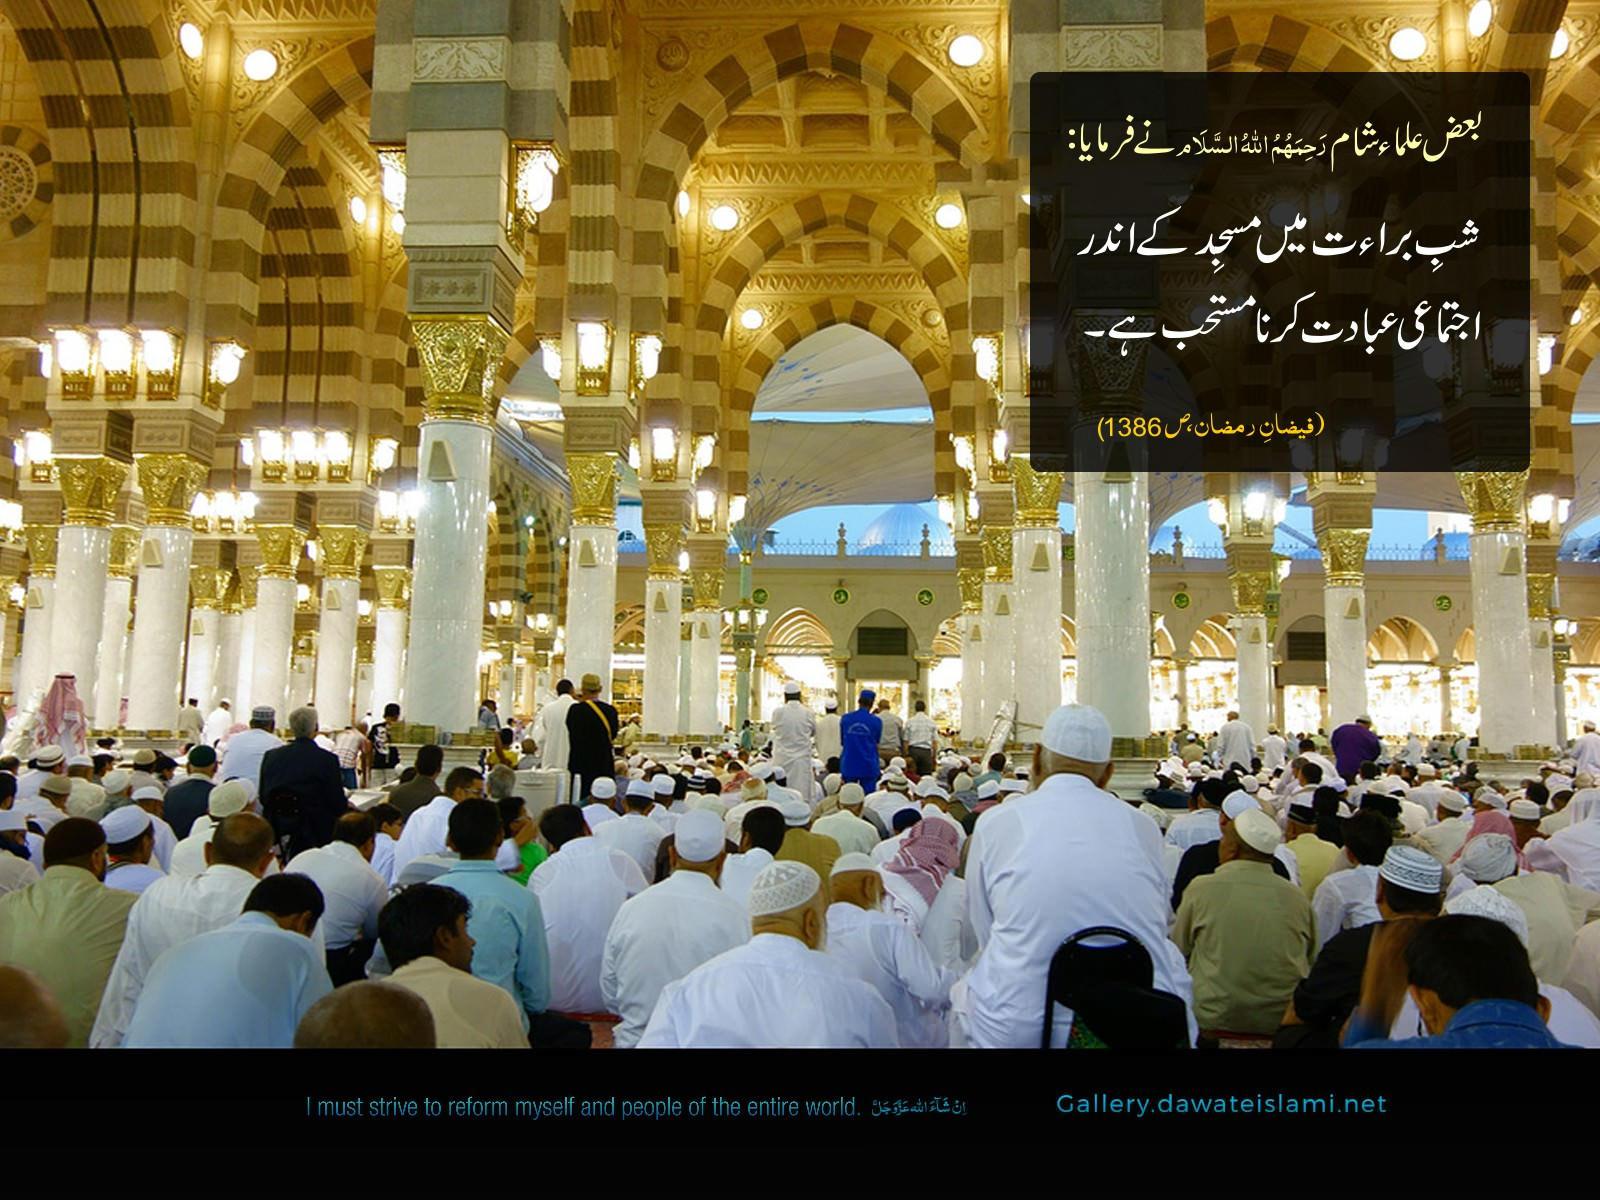 Shab E Barat Wallpaper- Ijtimai Ibadat